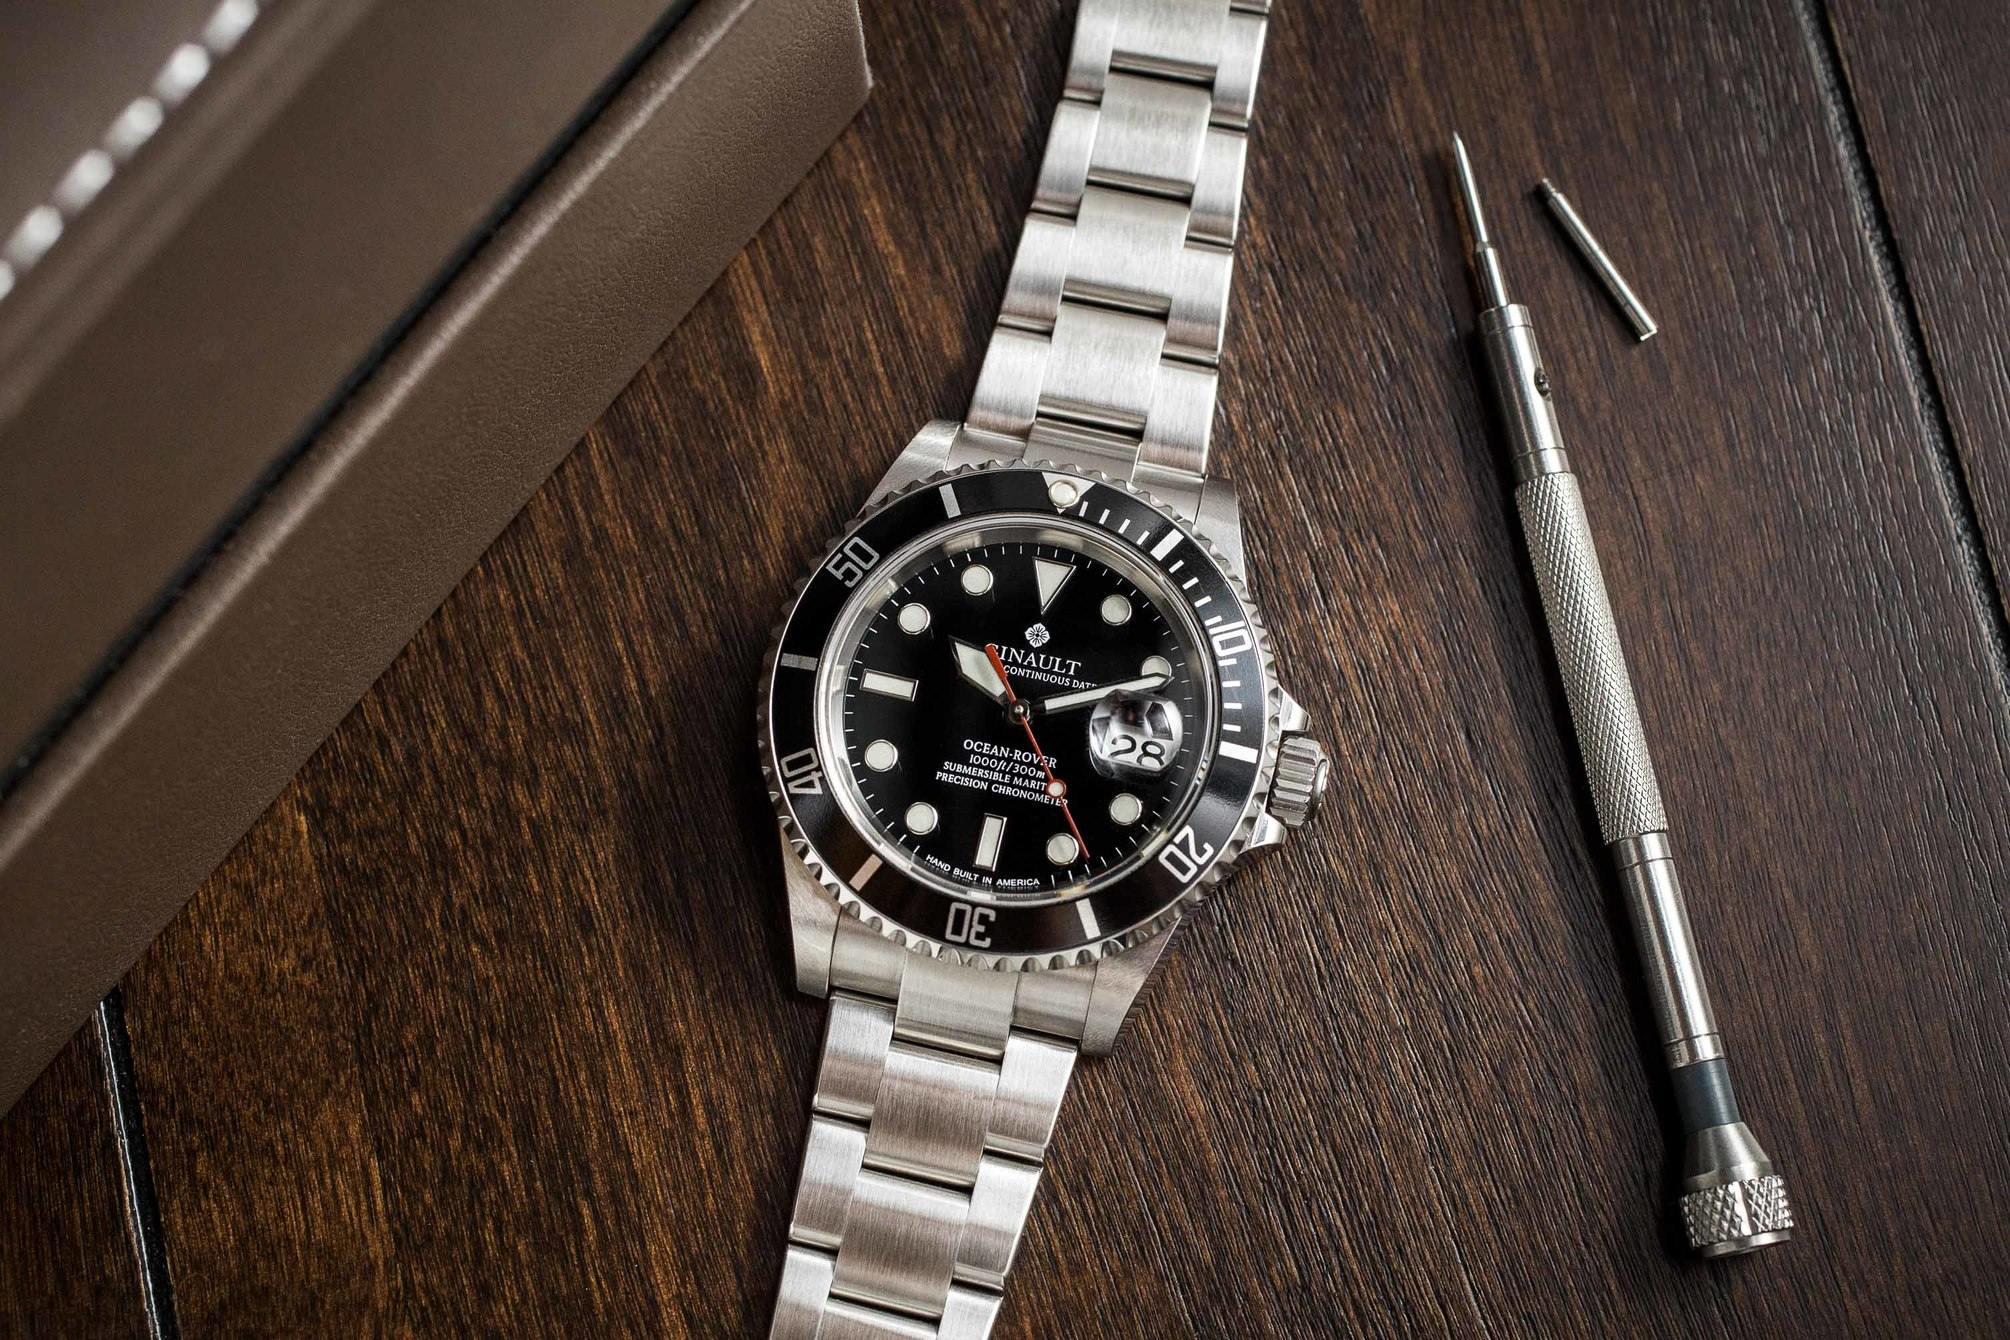 Ginautl watch tool included